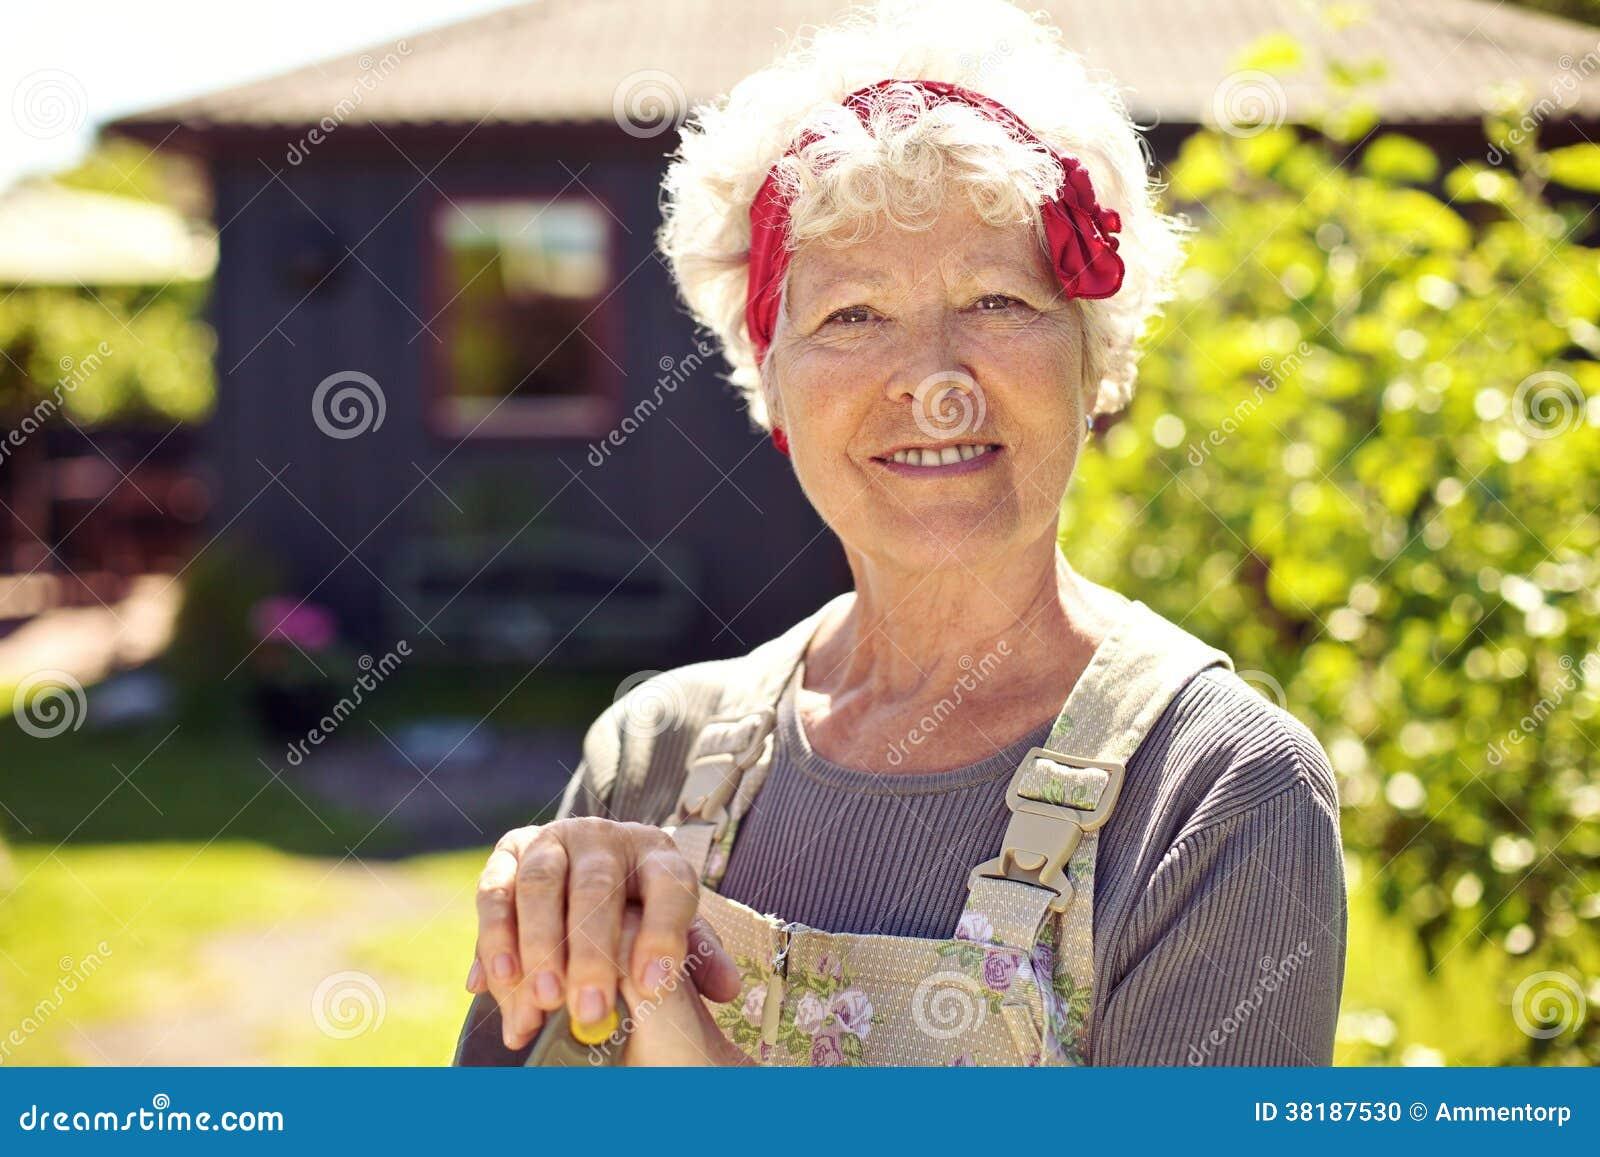 Active senior woman standing in backyard garden